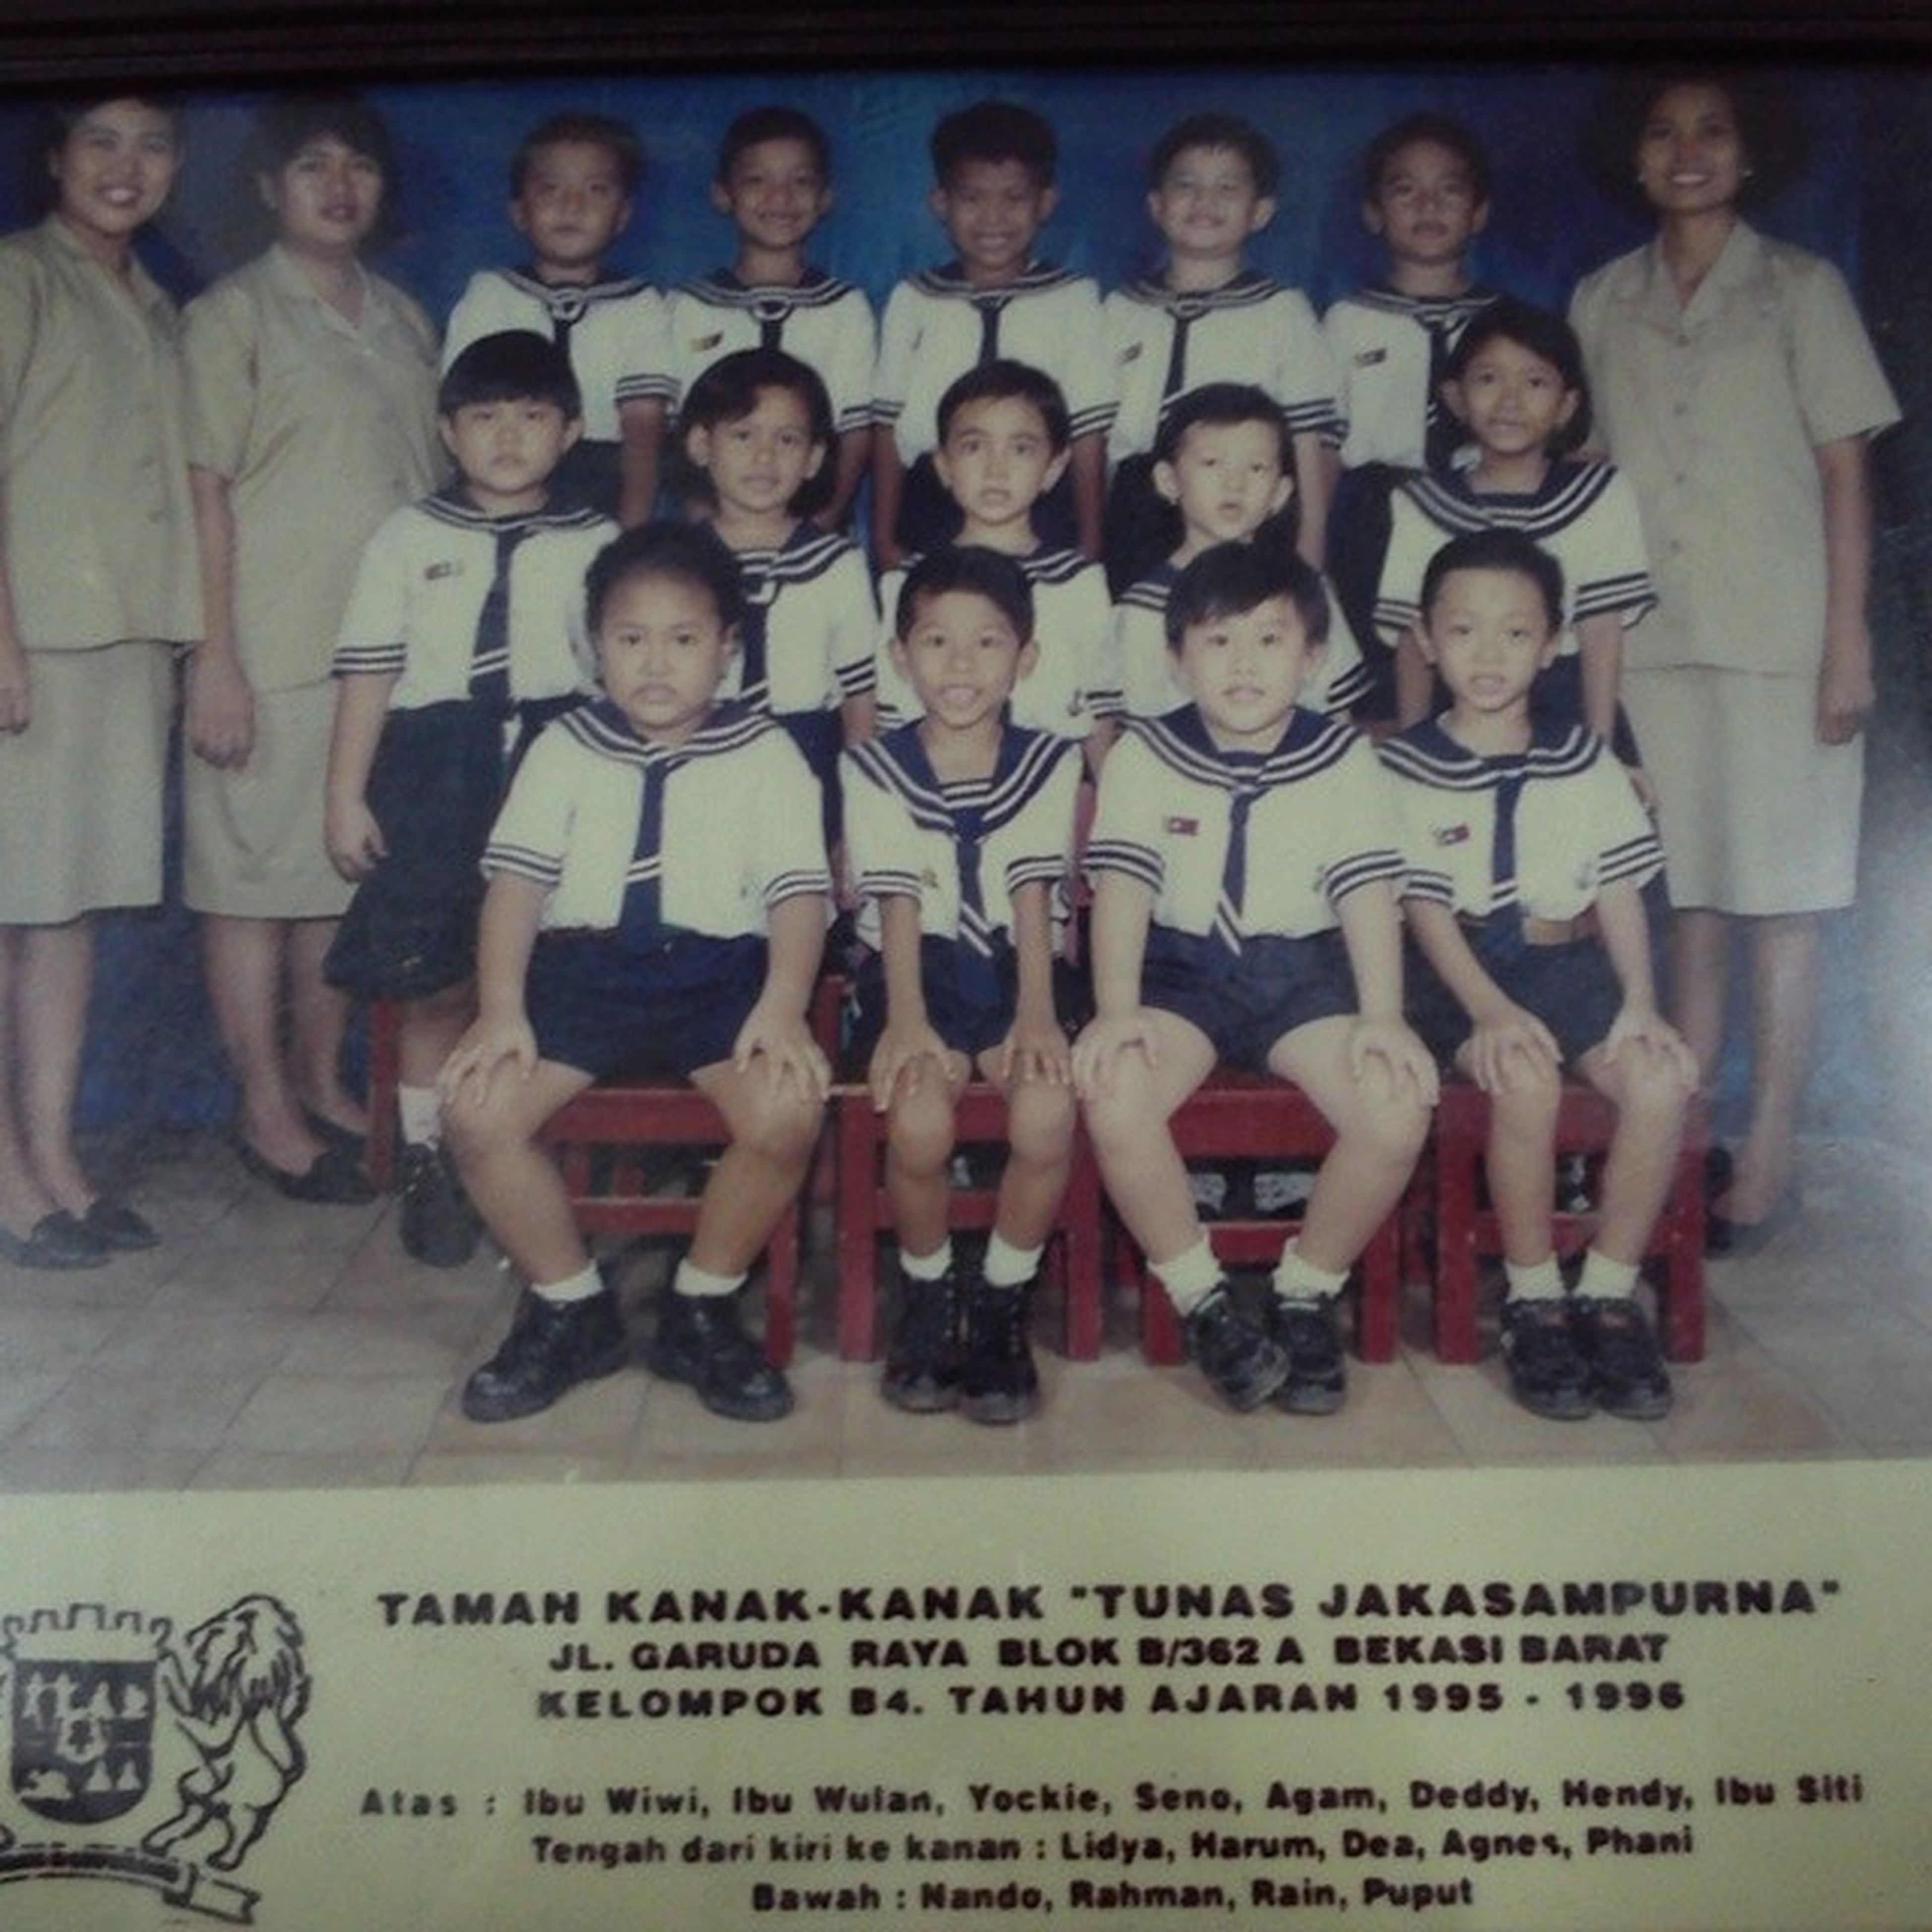 my childhood ;) Tunasjakasampurnakranji